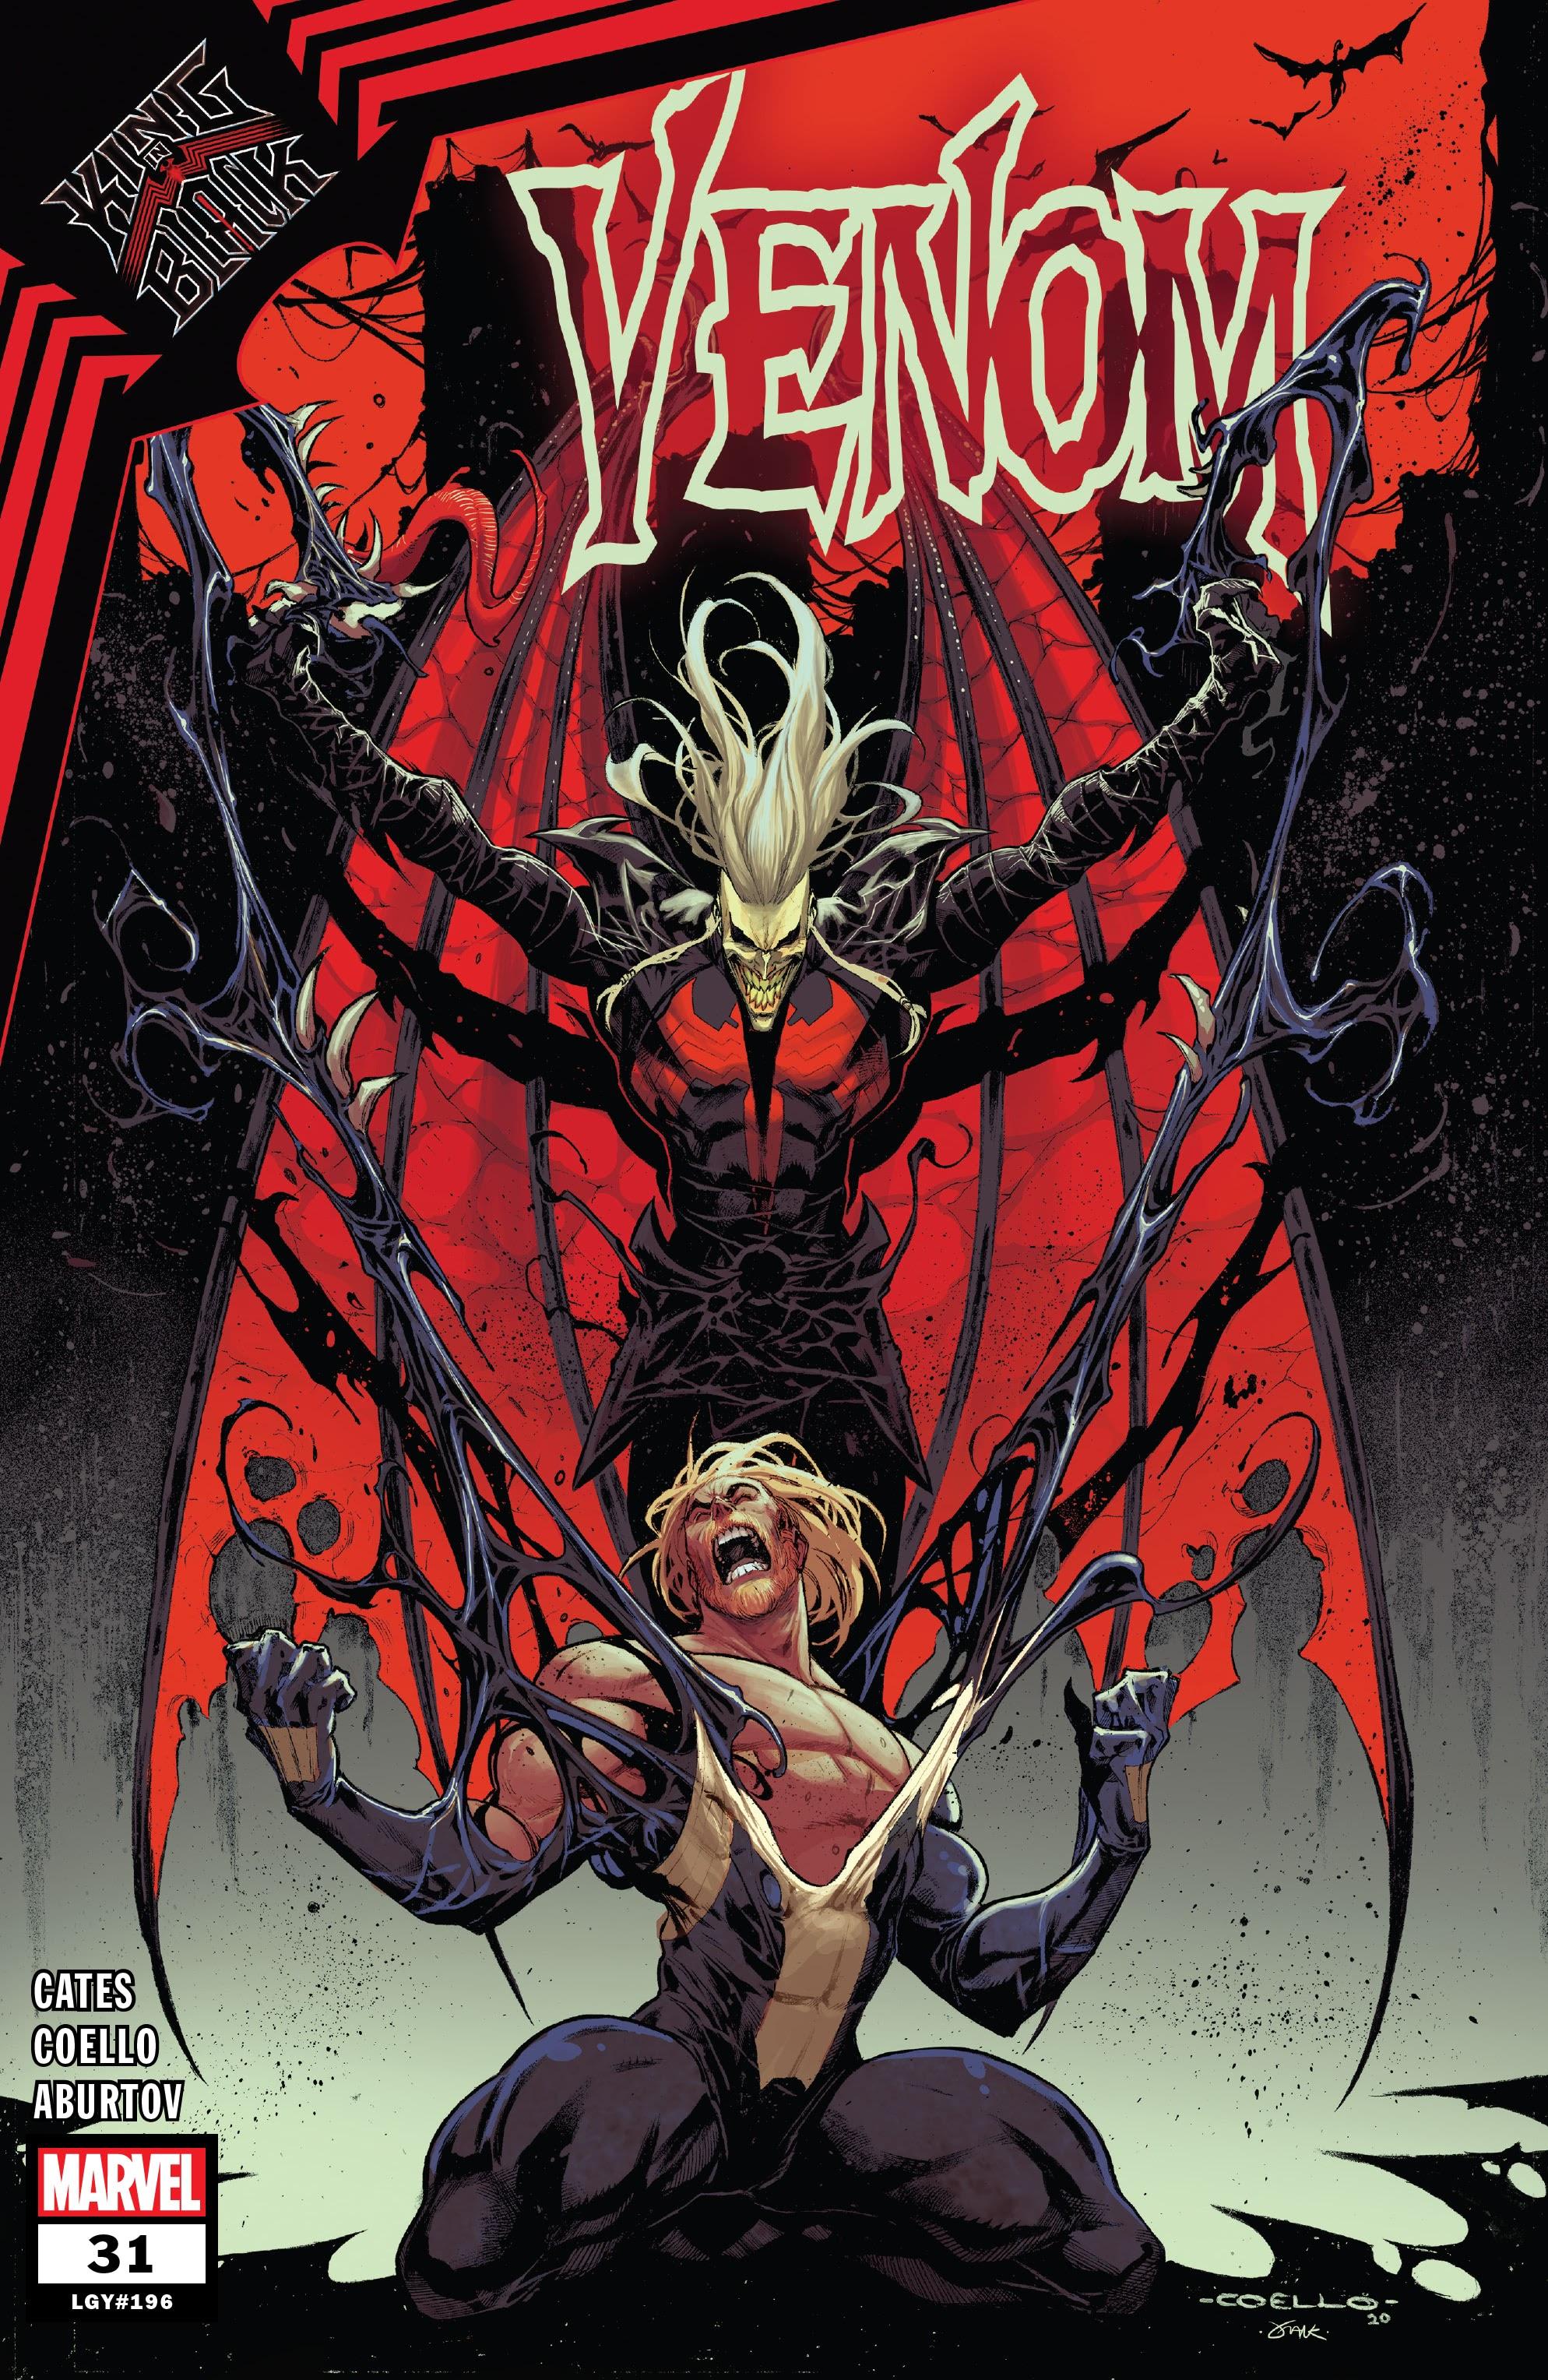 Venom (2018) 31 Page 1